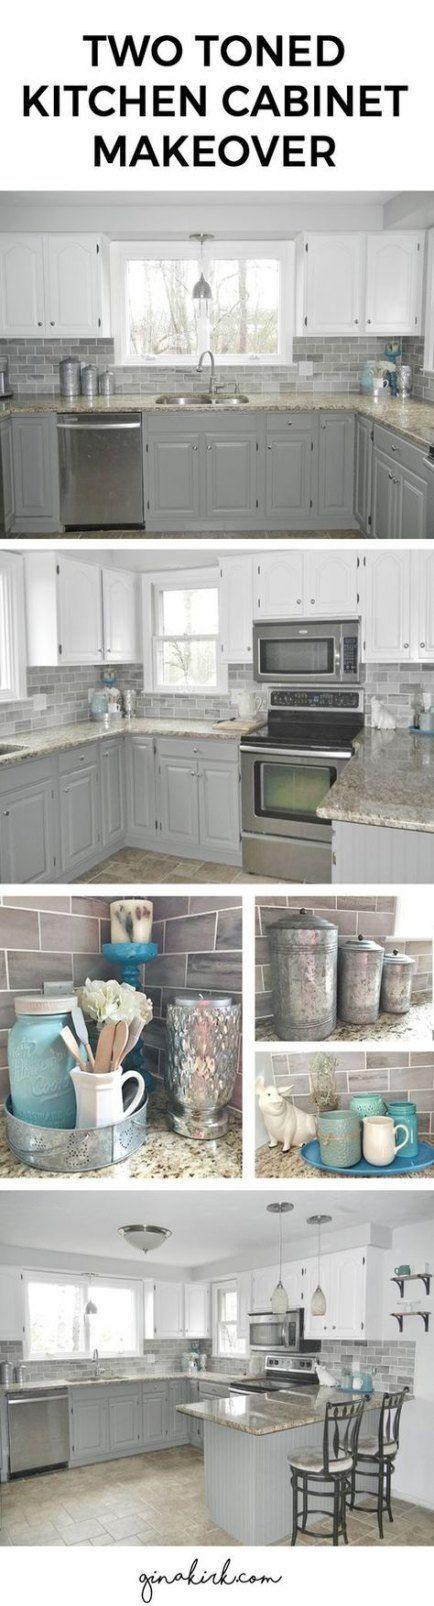 Kitchen gray tile fixer upper 64 Ideasfixer